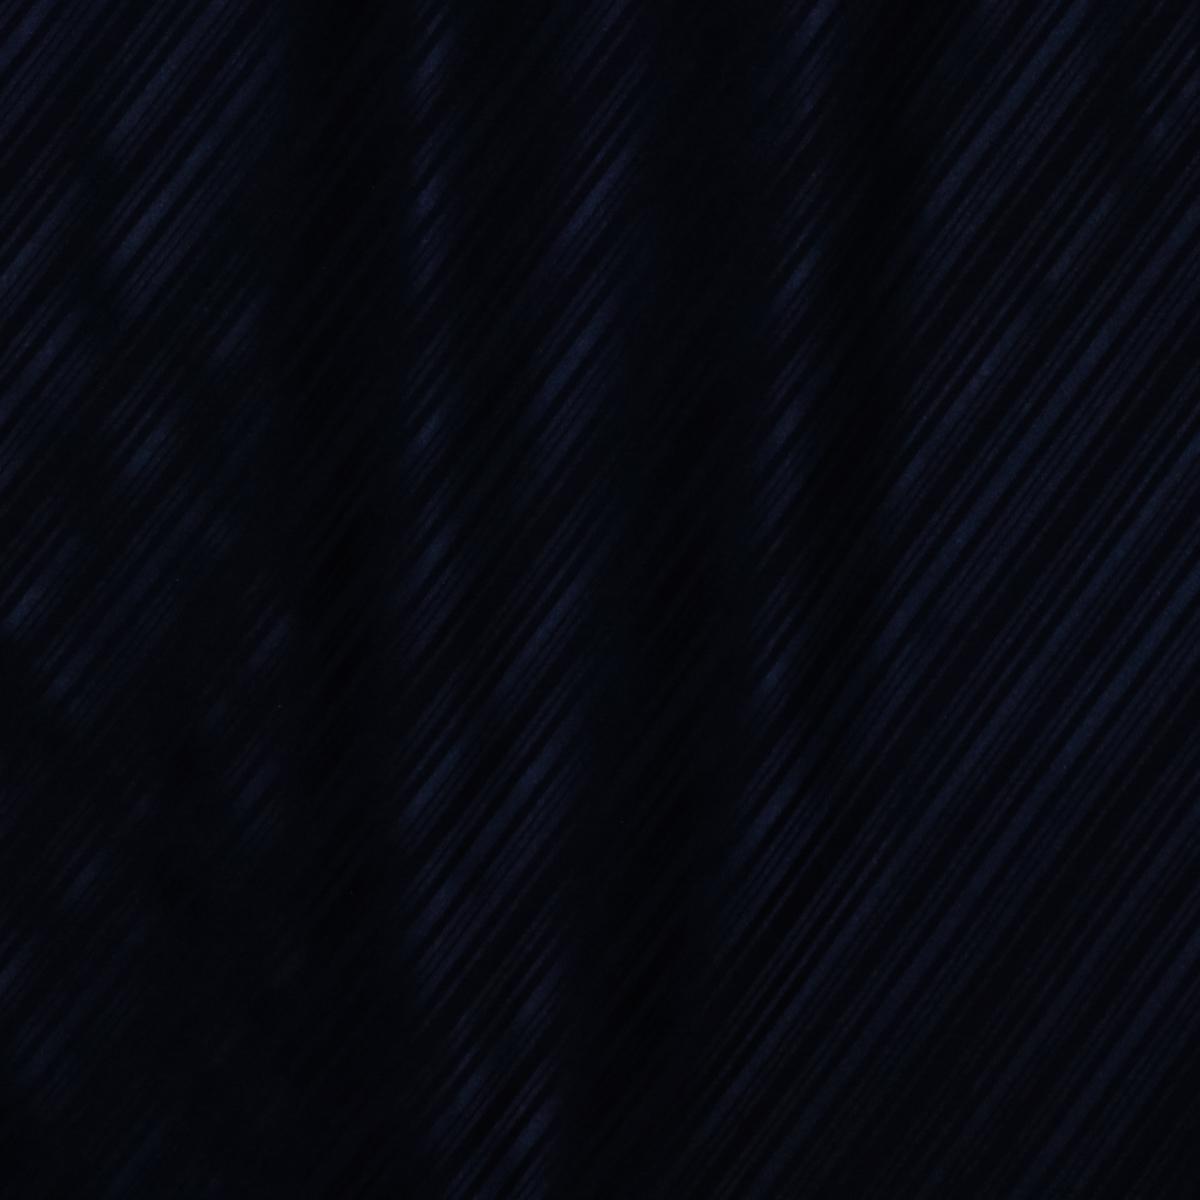 Шелковая ткань в атласную полоску